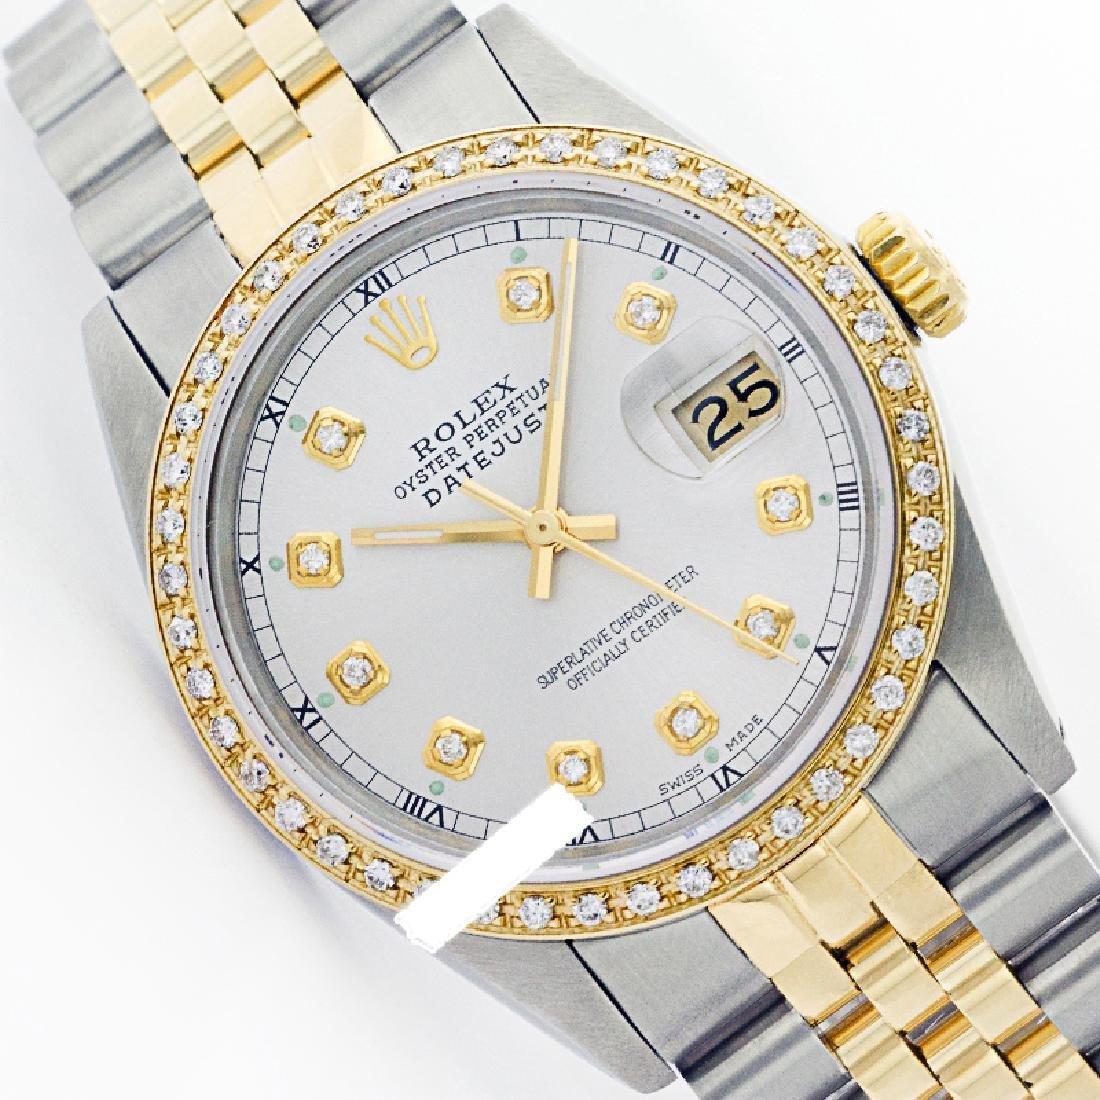 Rolex Men's Two Tone 14K Gold/SS, QuickSet, Diamond